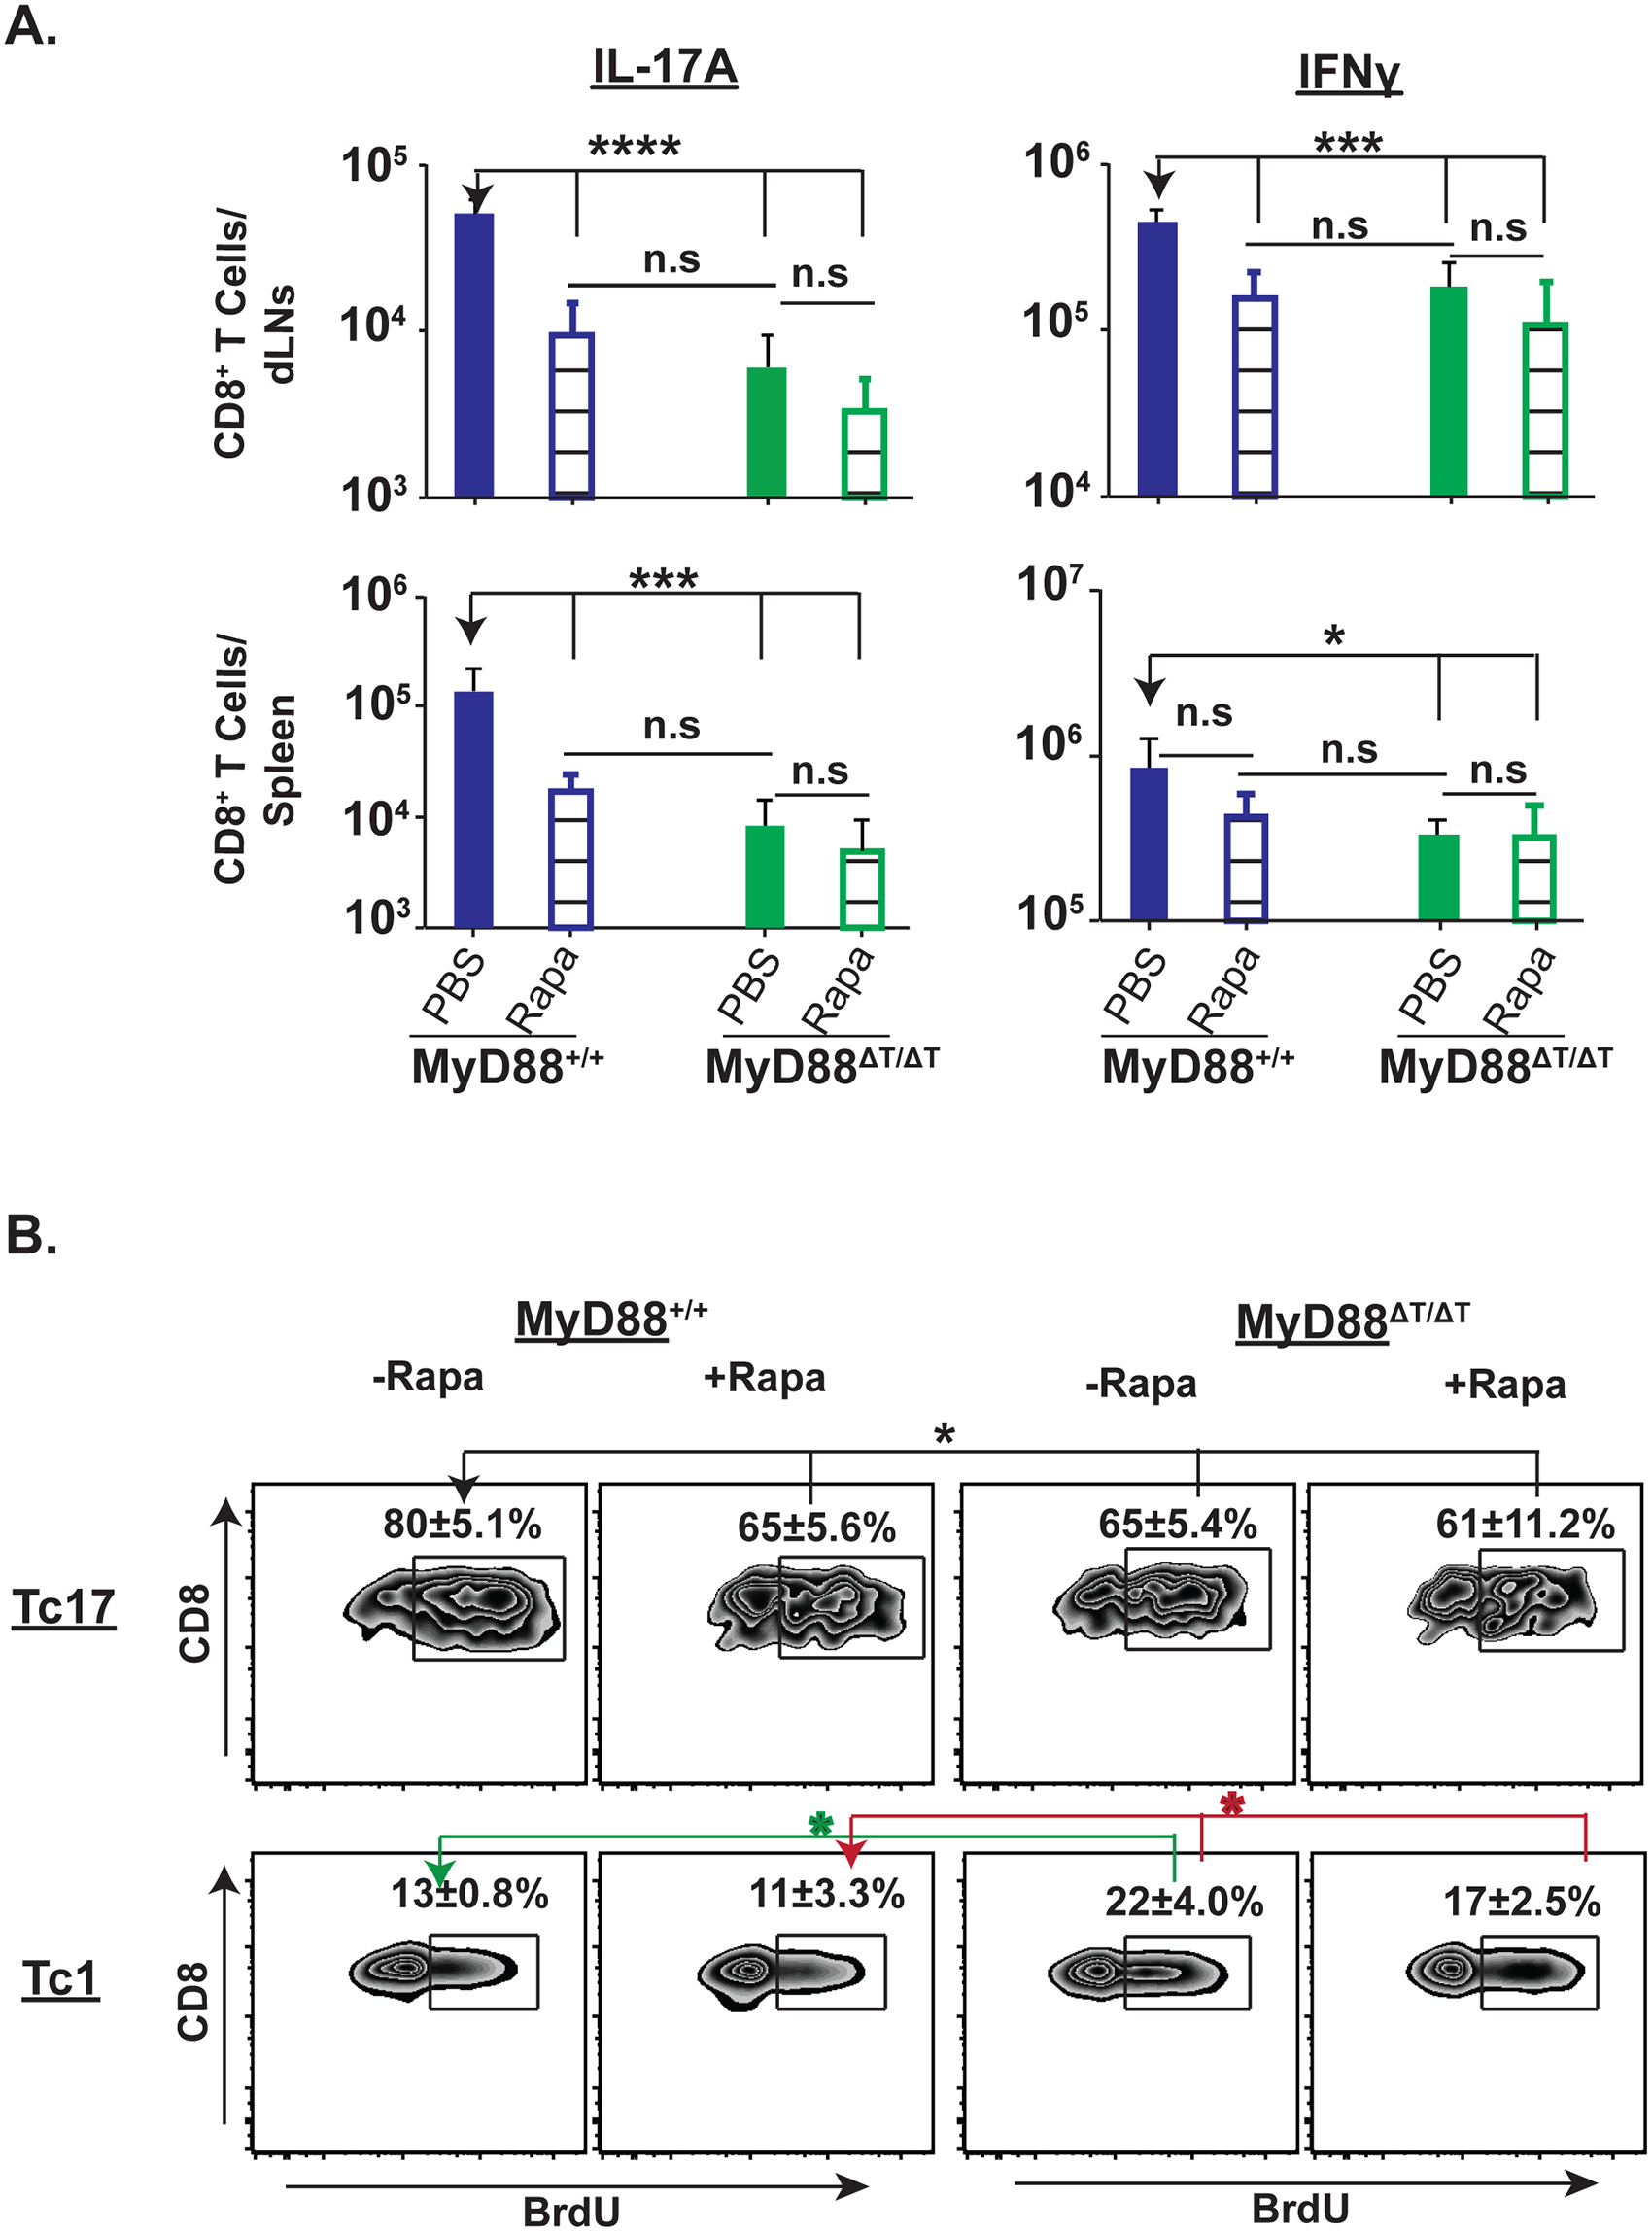 Rapamycin treatment blunts Tc17 cell responses and proliferation.